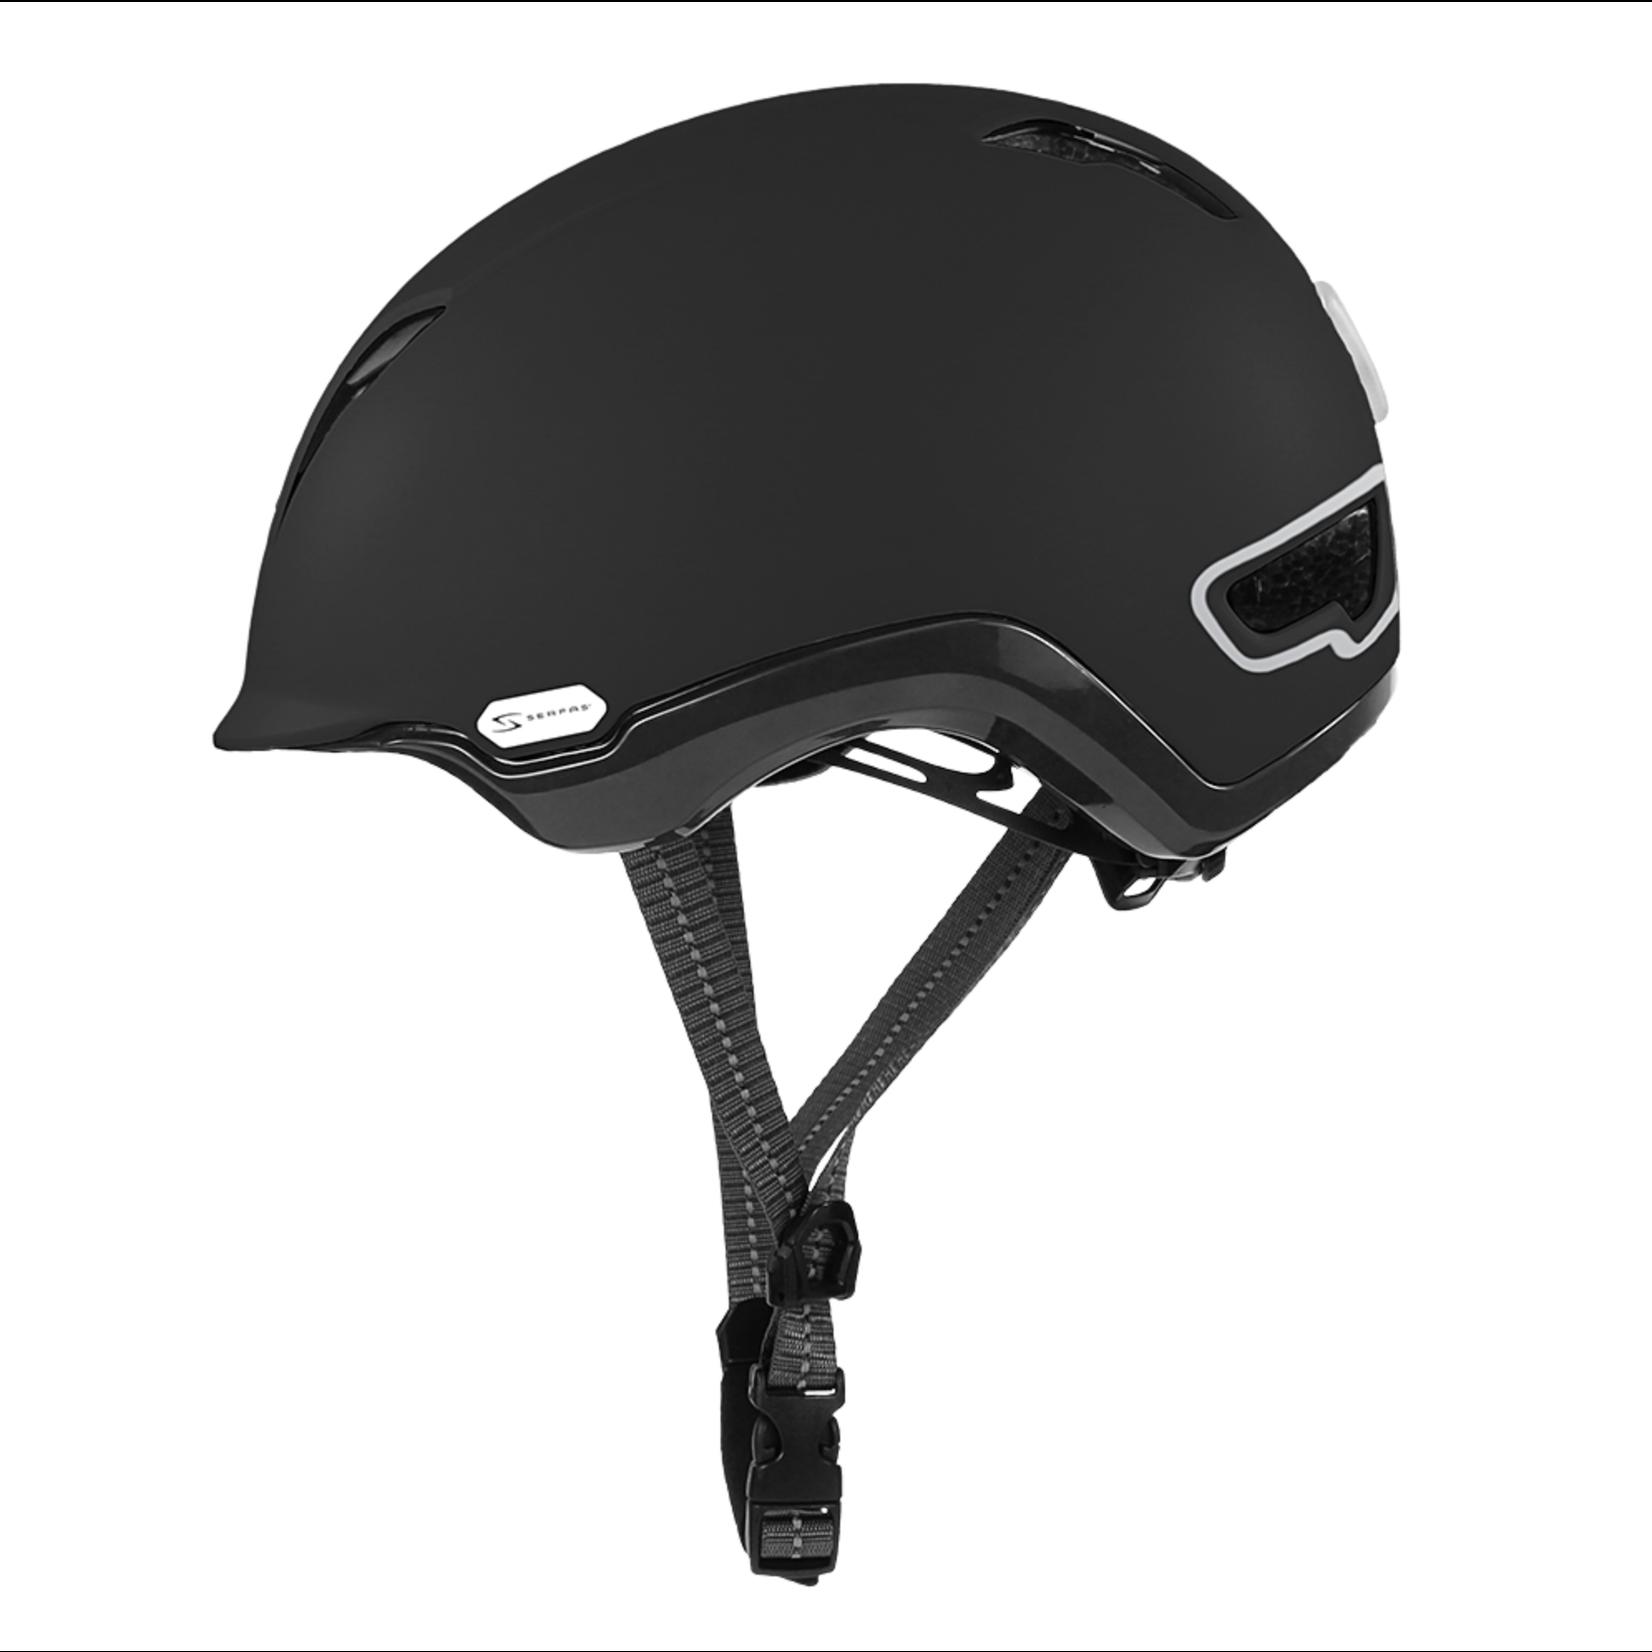 SERFAS Helmet HT-504MTBK KILOWATT E-BIKE MATTE BLACK L/XL (SERFAS)